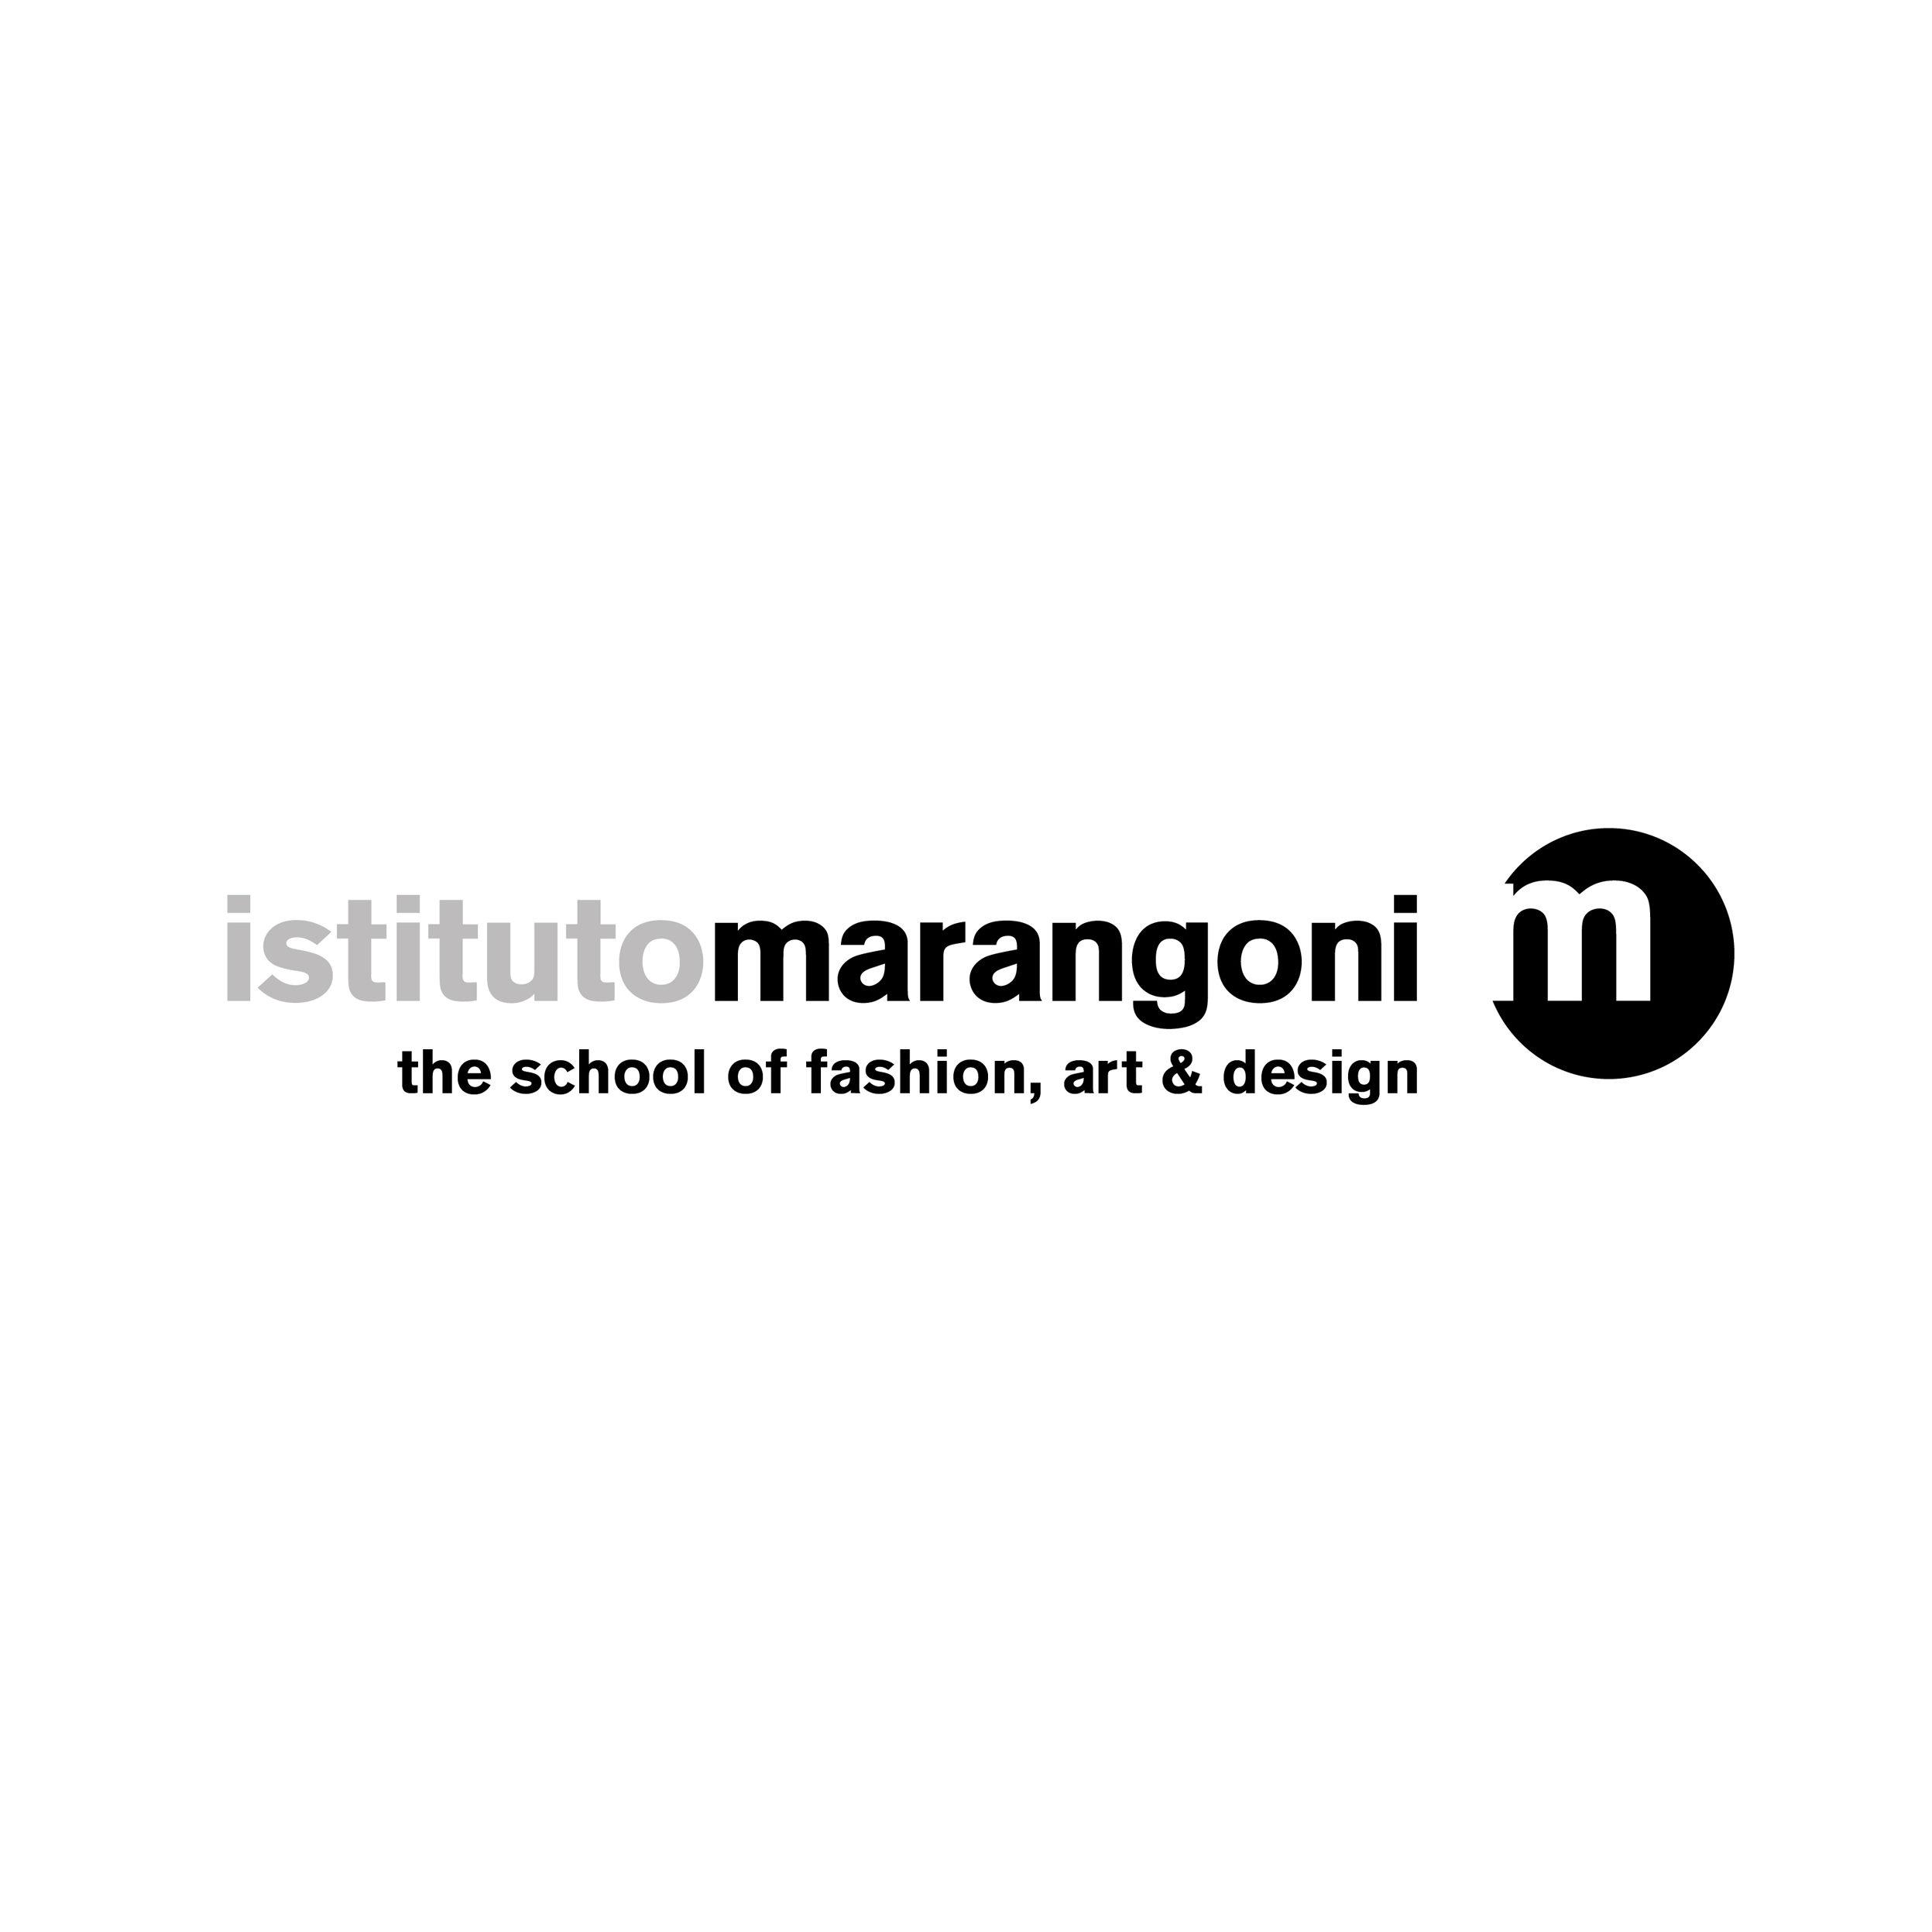 IM_logo_-the-school-of-fashion,-art-&-design-positive-01